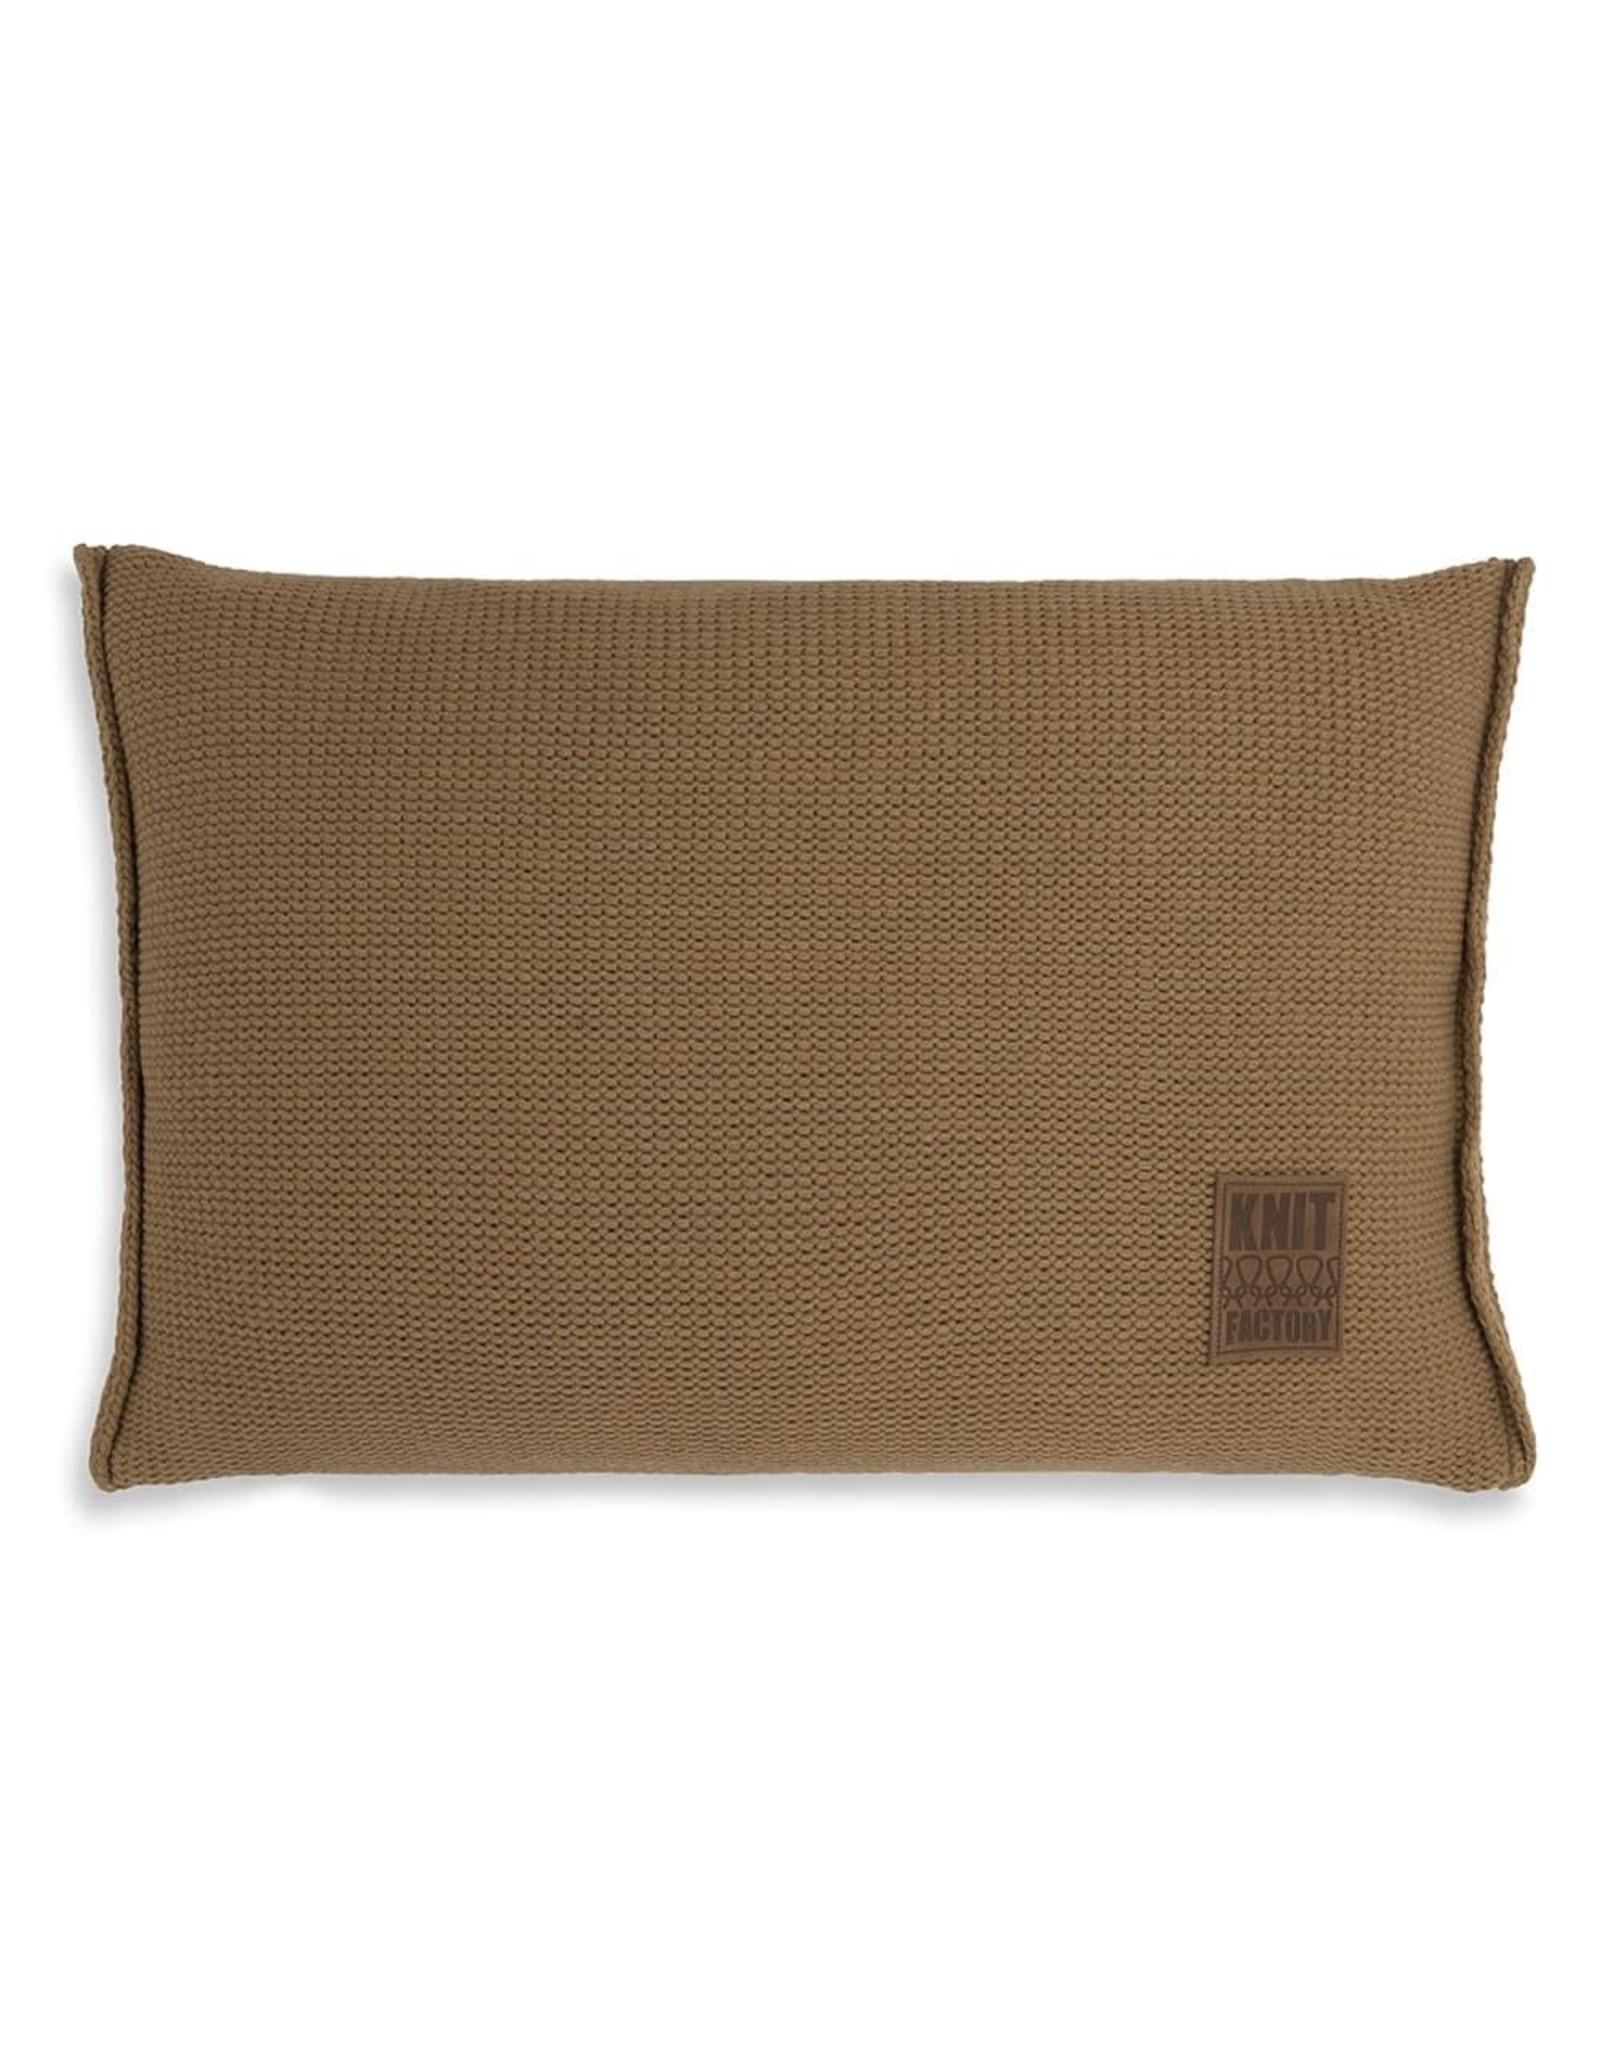 Knit Factory Knit Factory kussen Uni 60x40 New Camel